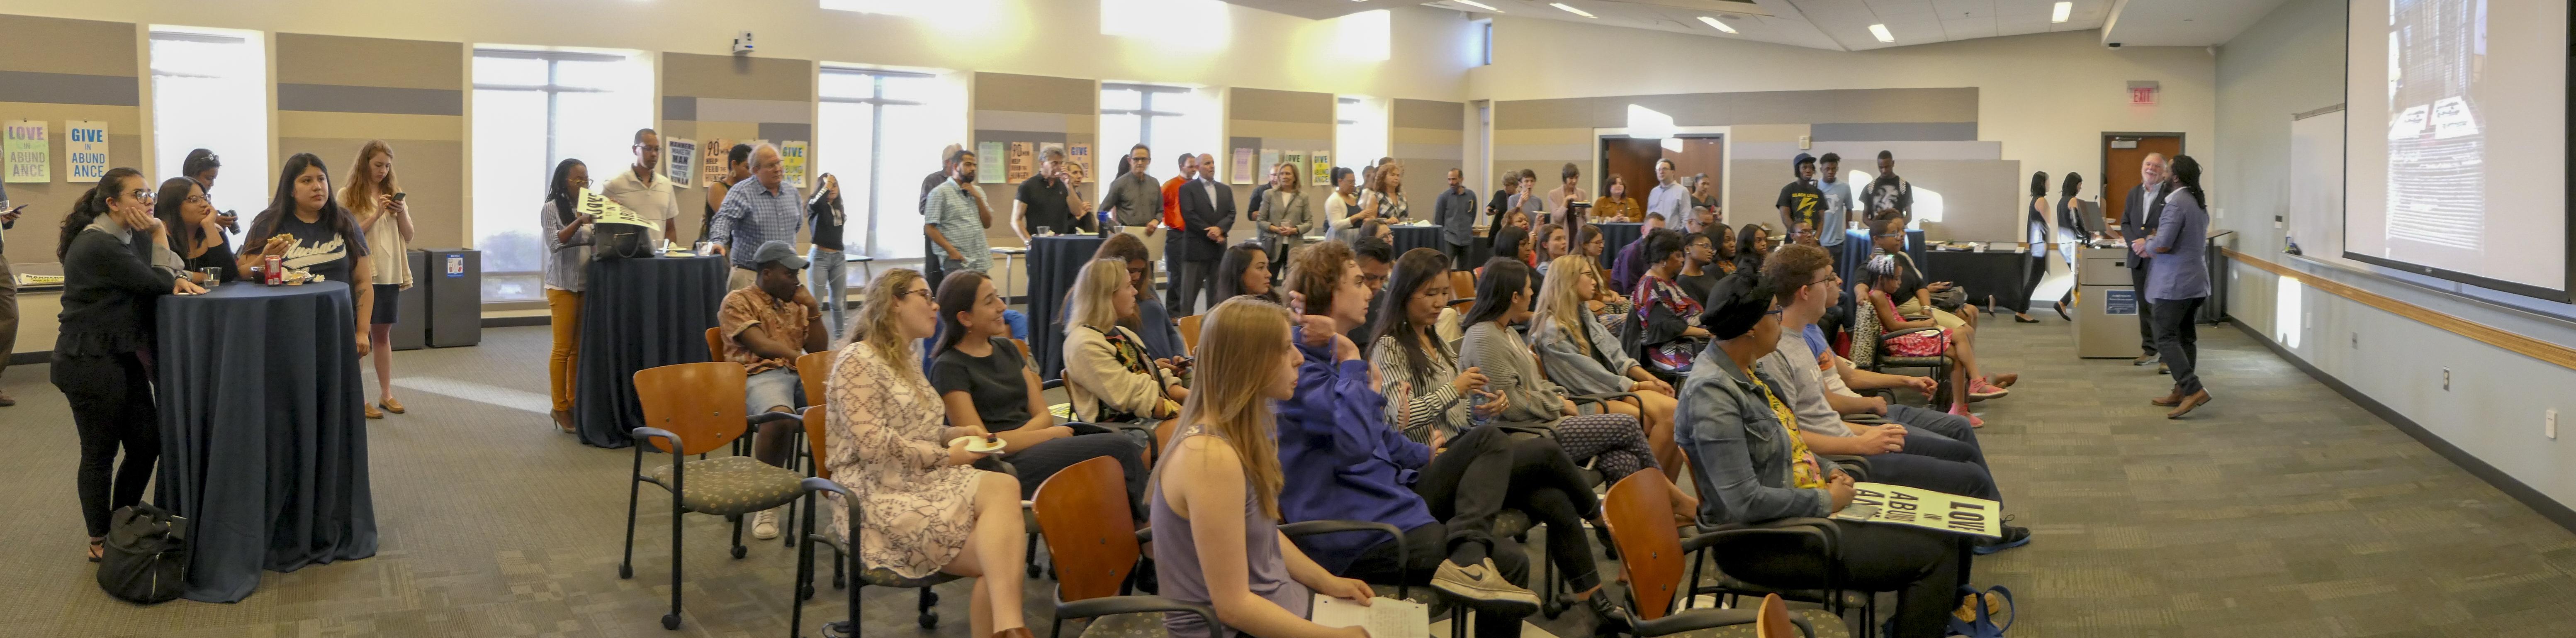 220 Art + Social Engagement Project Unveiling 04302018